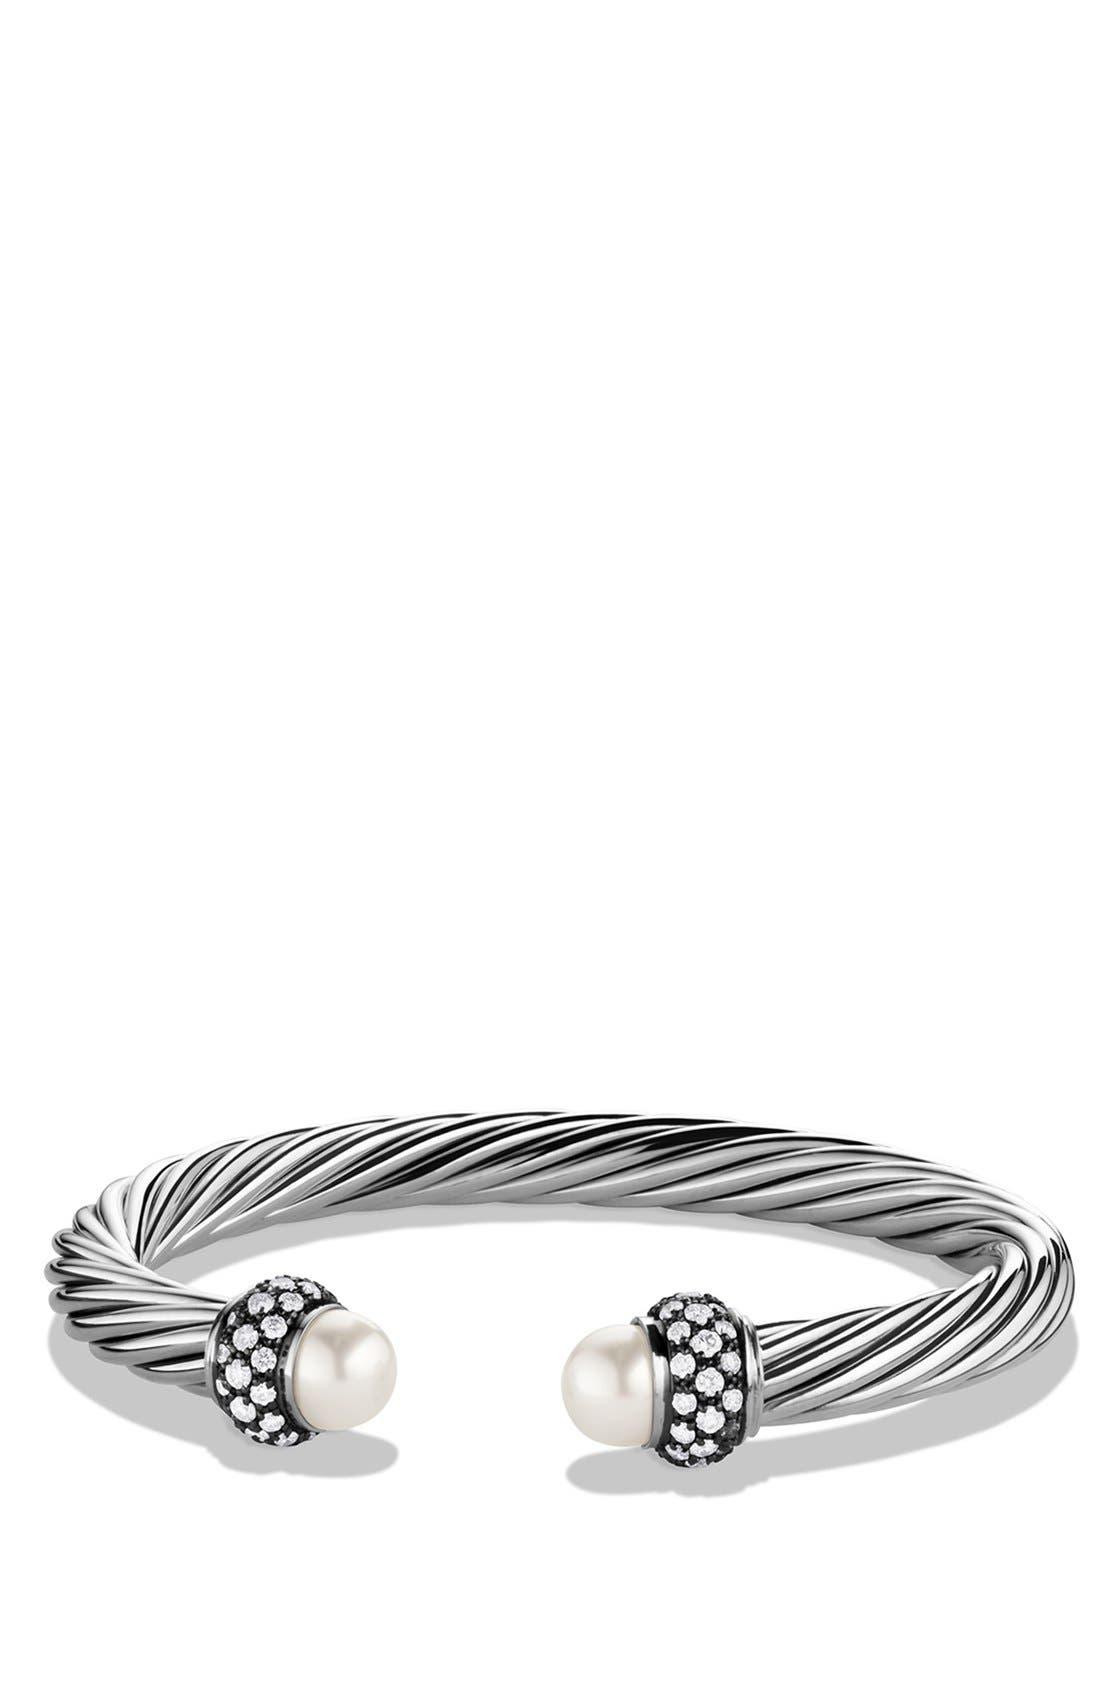 Main Image - David Yurman 'Cable Classics' Bracelet with Pearls and Diamonds